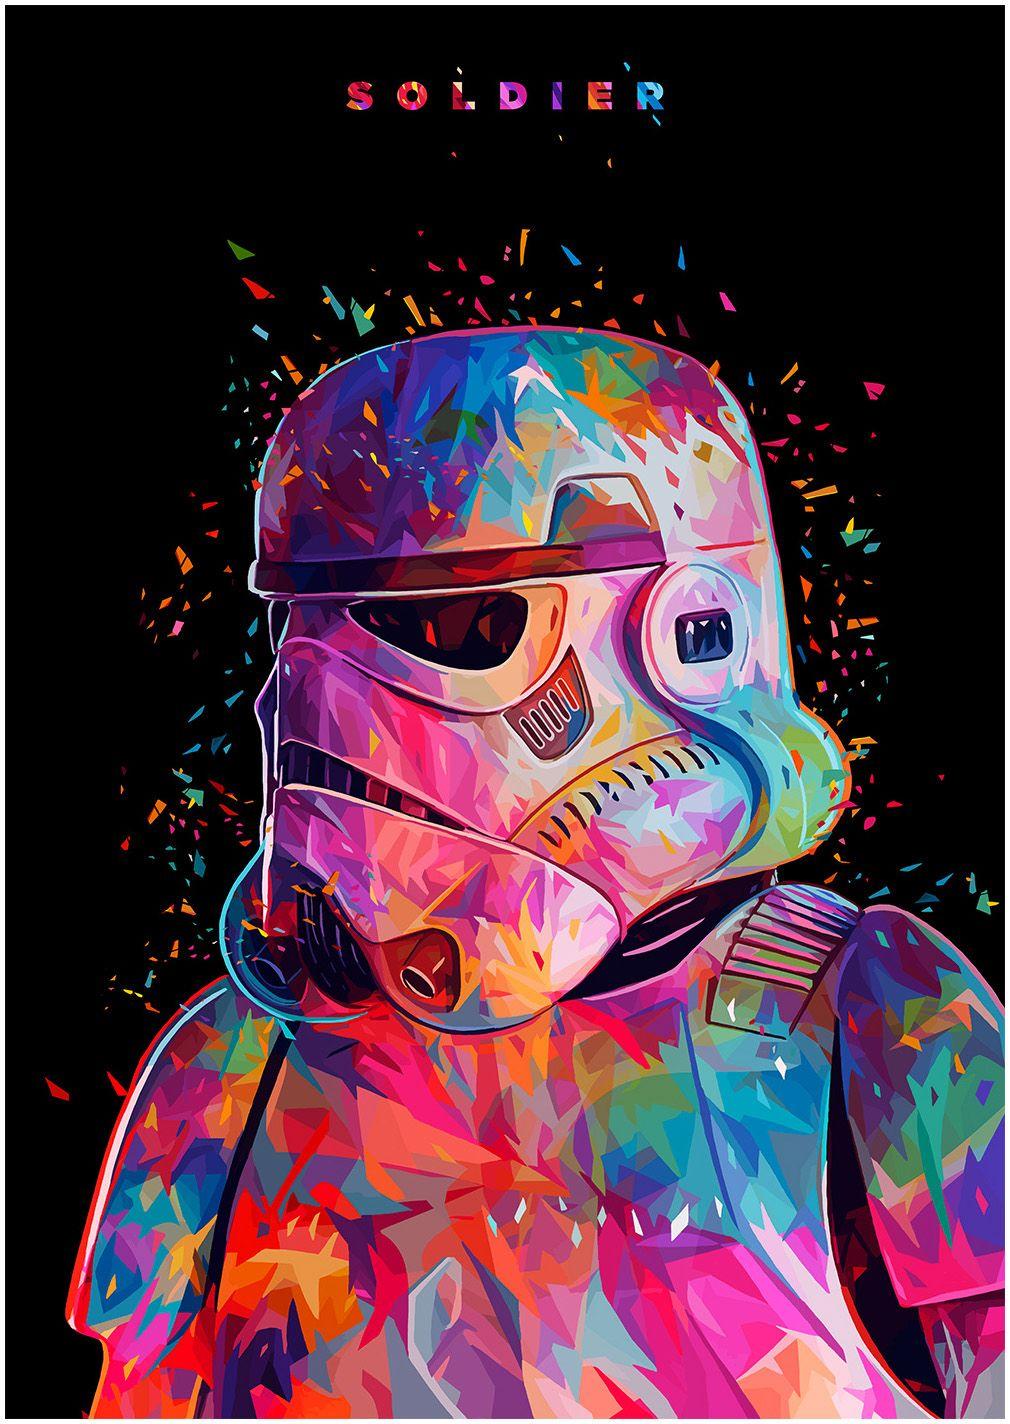 Star Wars Tribute On Behance Star Wars Pinterest Fondos